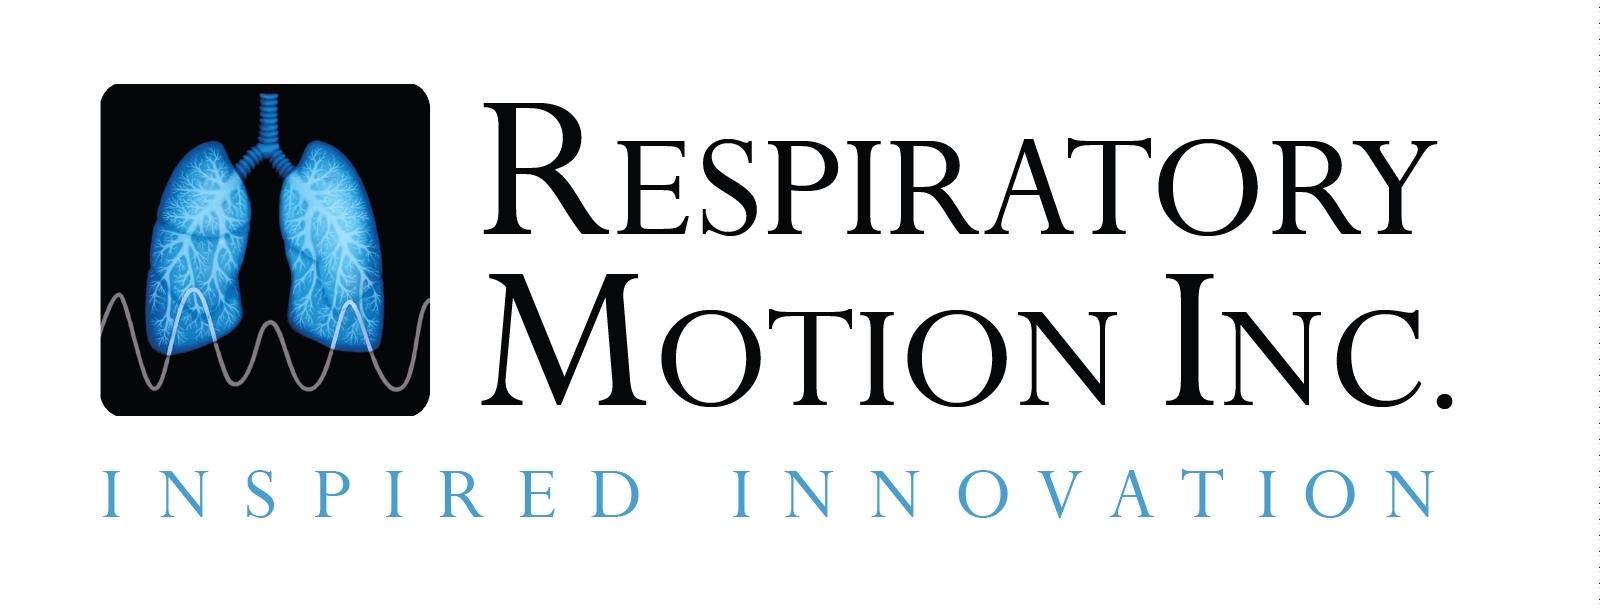 respiratorymotion